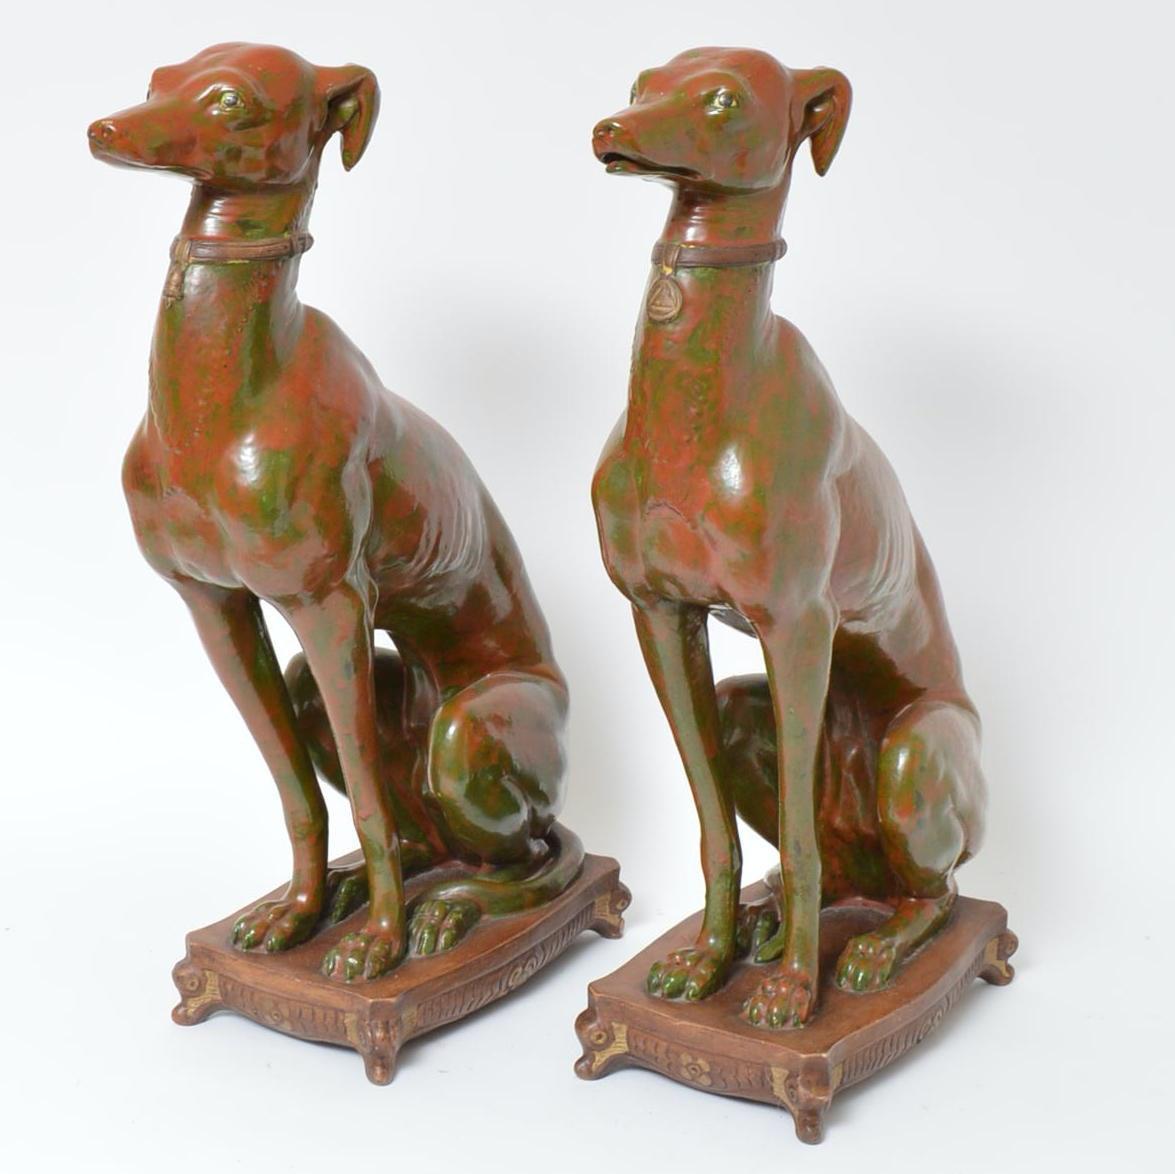 Italian Made Azawakh Dog Statuettes